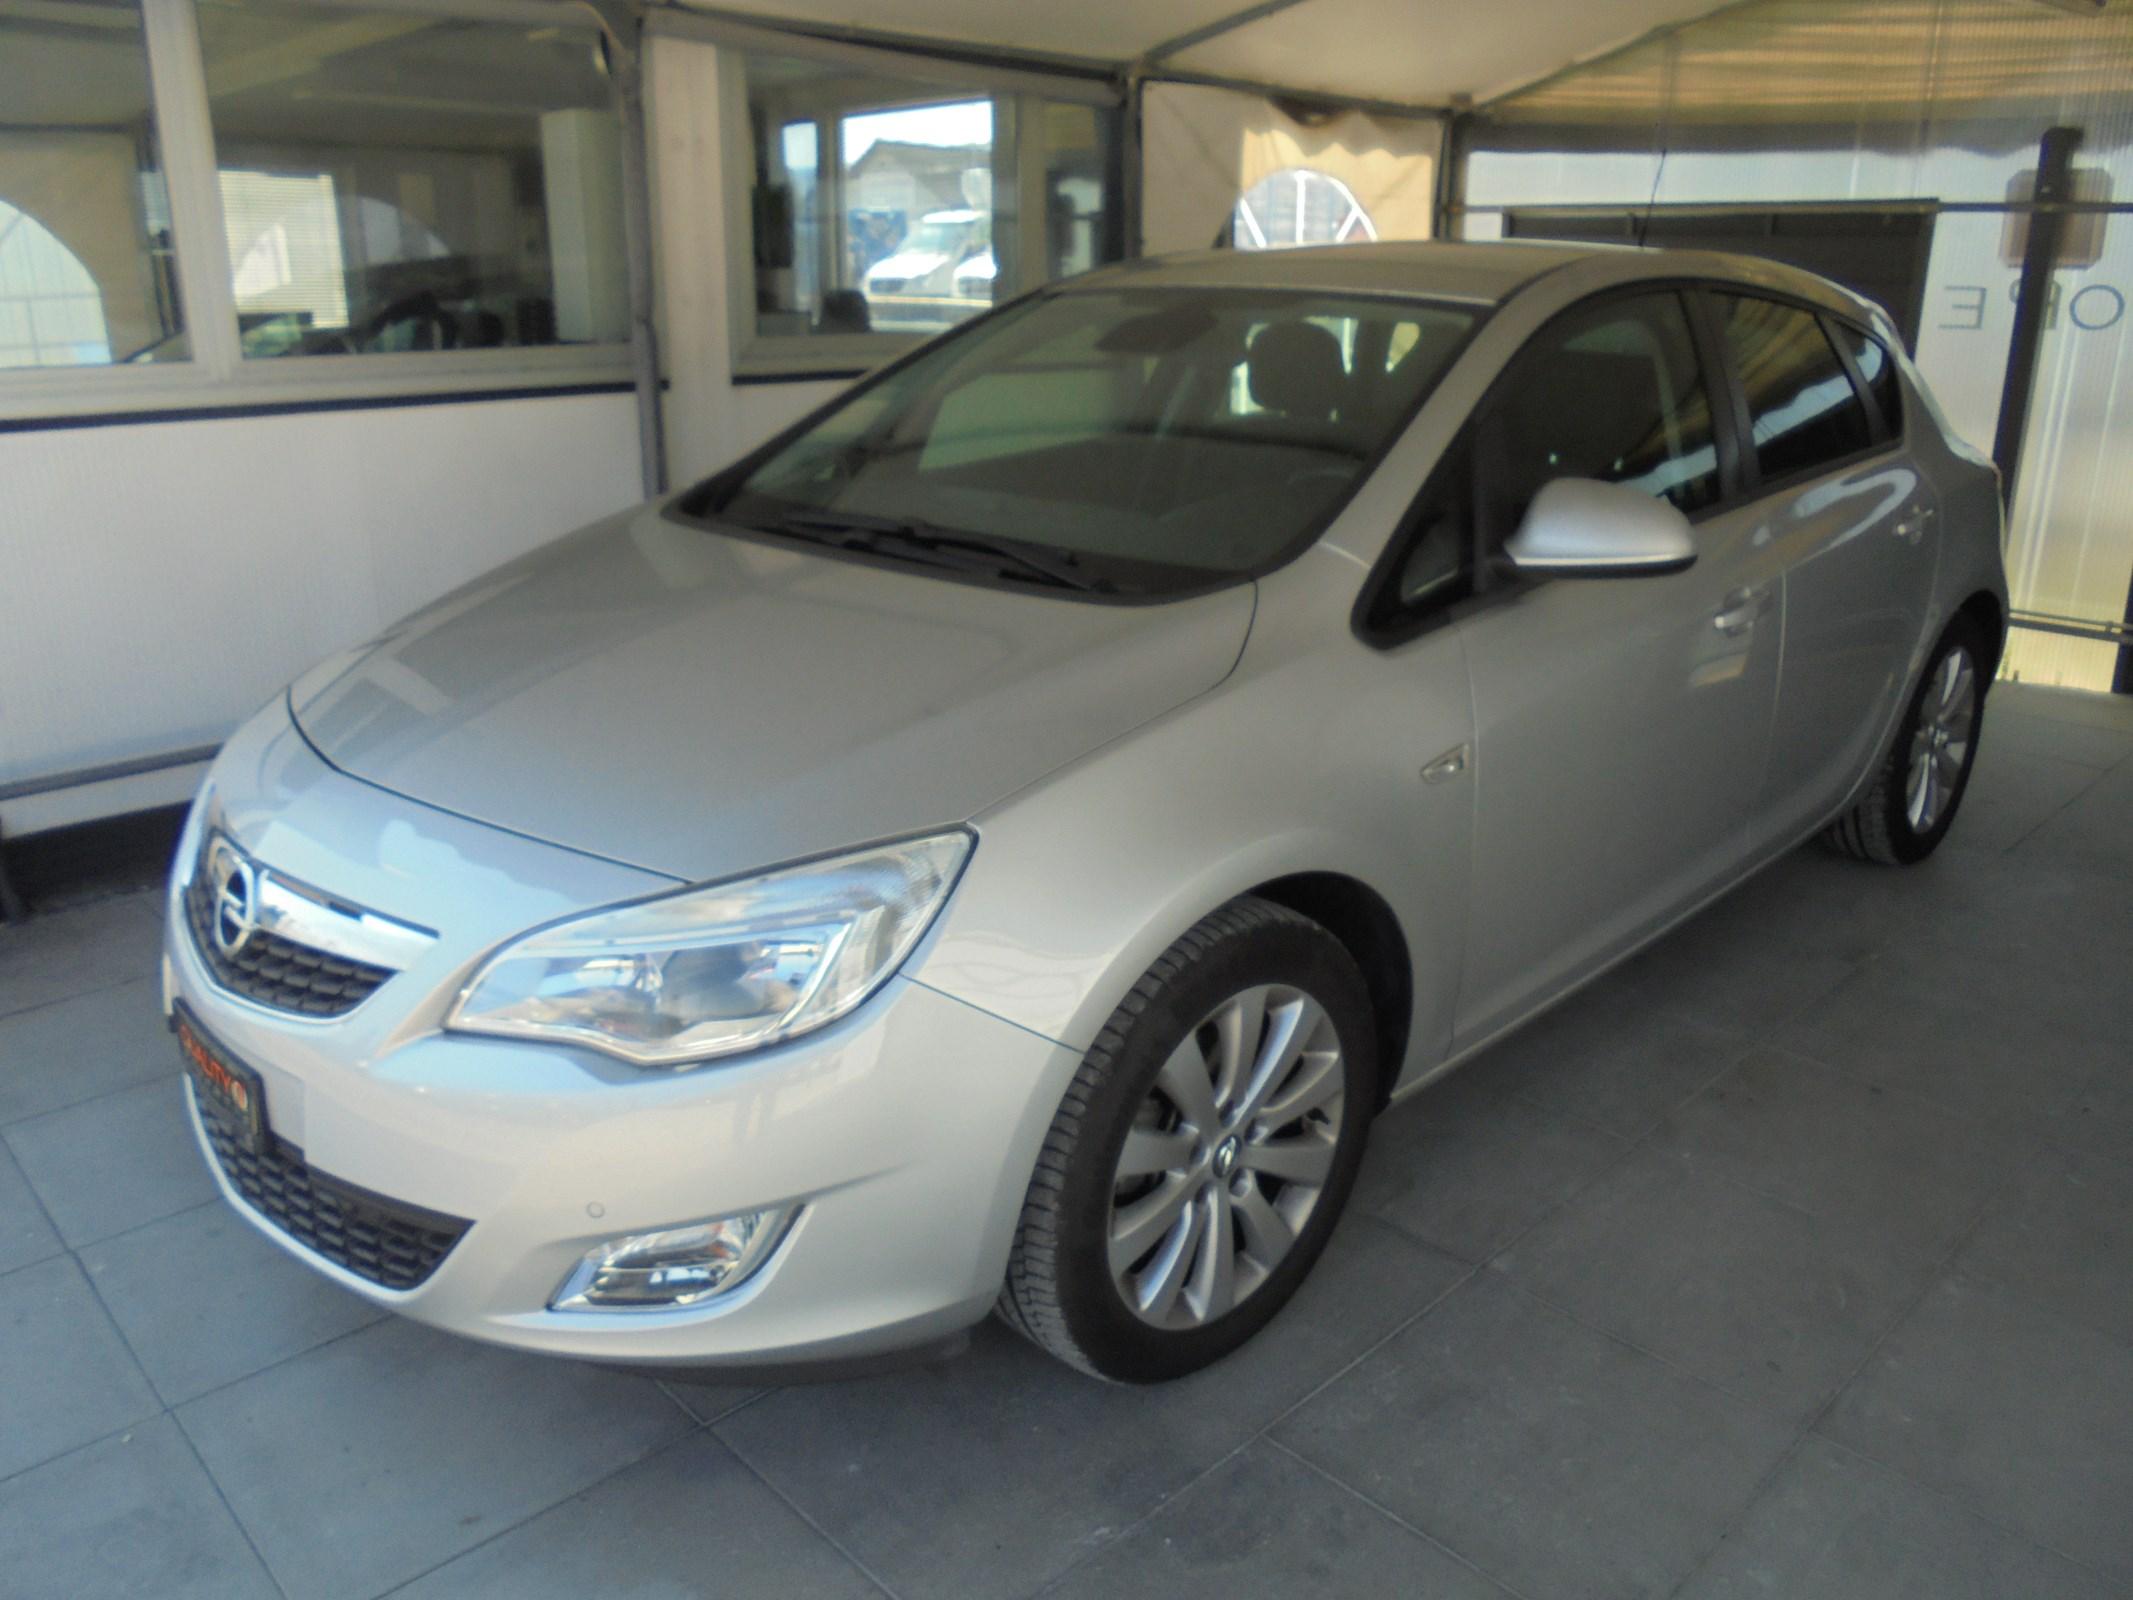 Buy Used Car Sedan Opel Astra 1 6i 16v Turbo Enjoy Automatic 121700 Km At 7700 Chf On Carforyou Ch